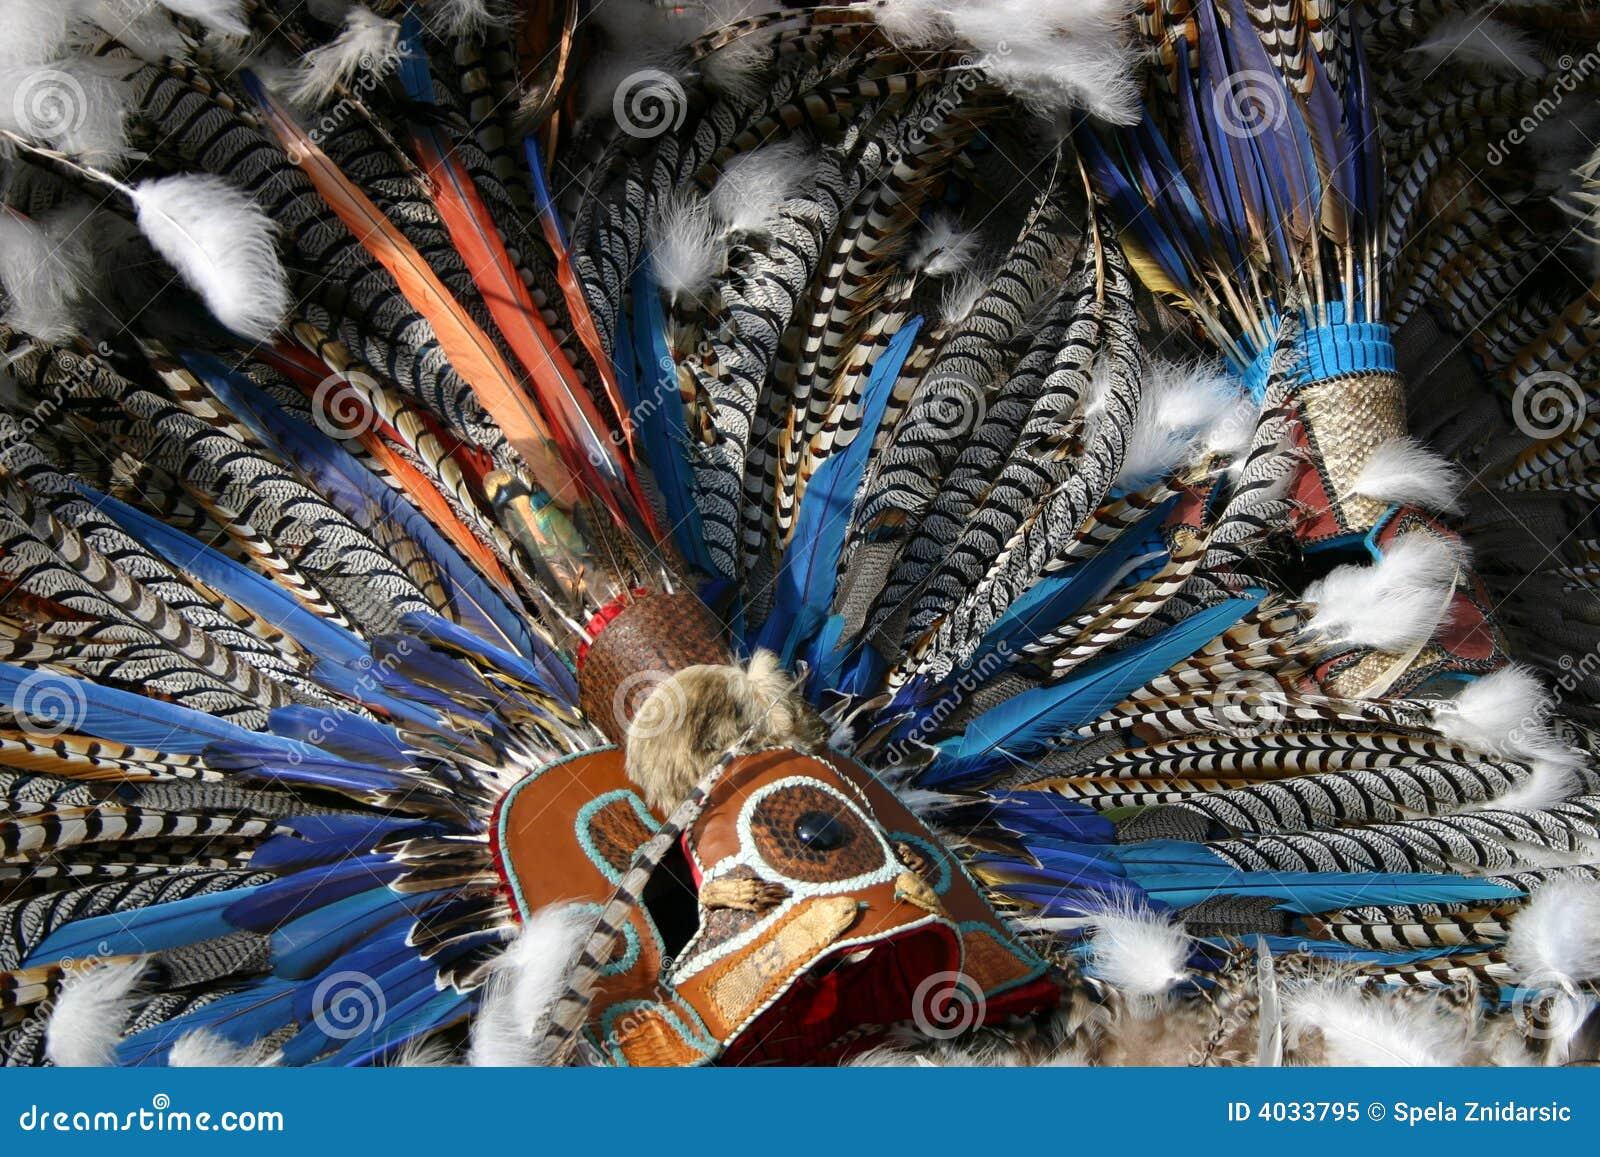 Aztec Mask on Aztec Dancer In Mexico